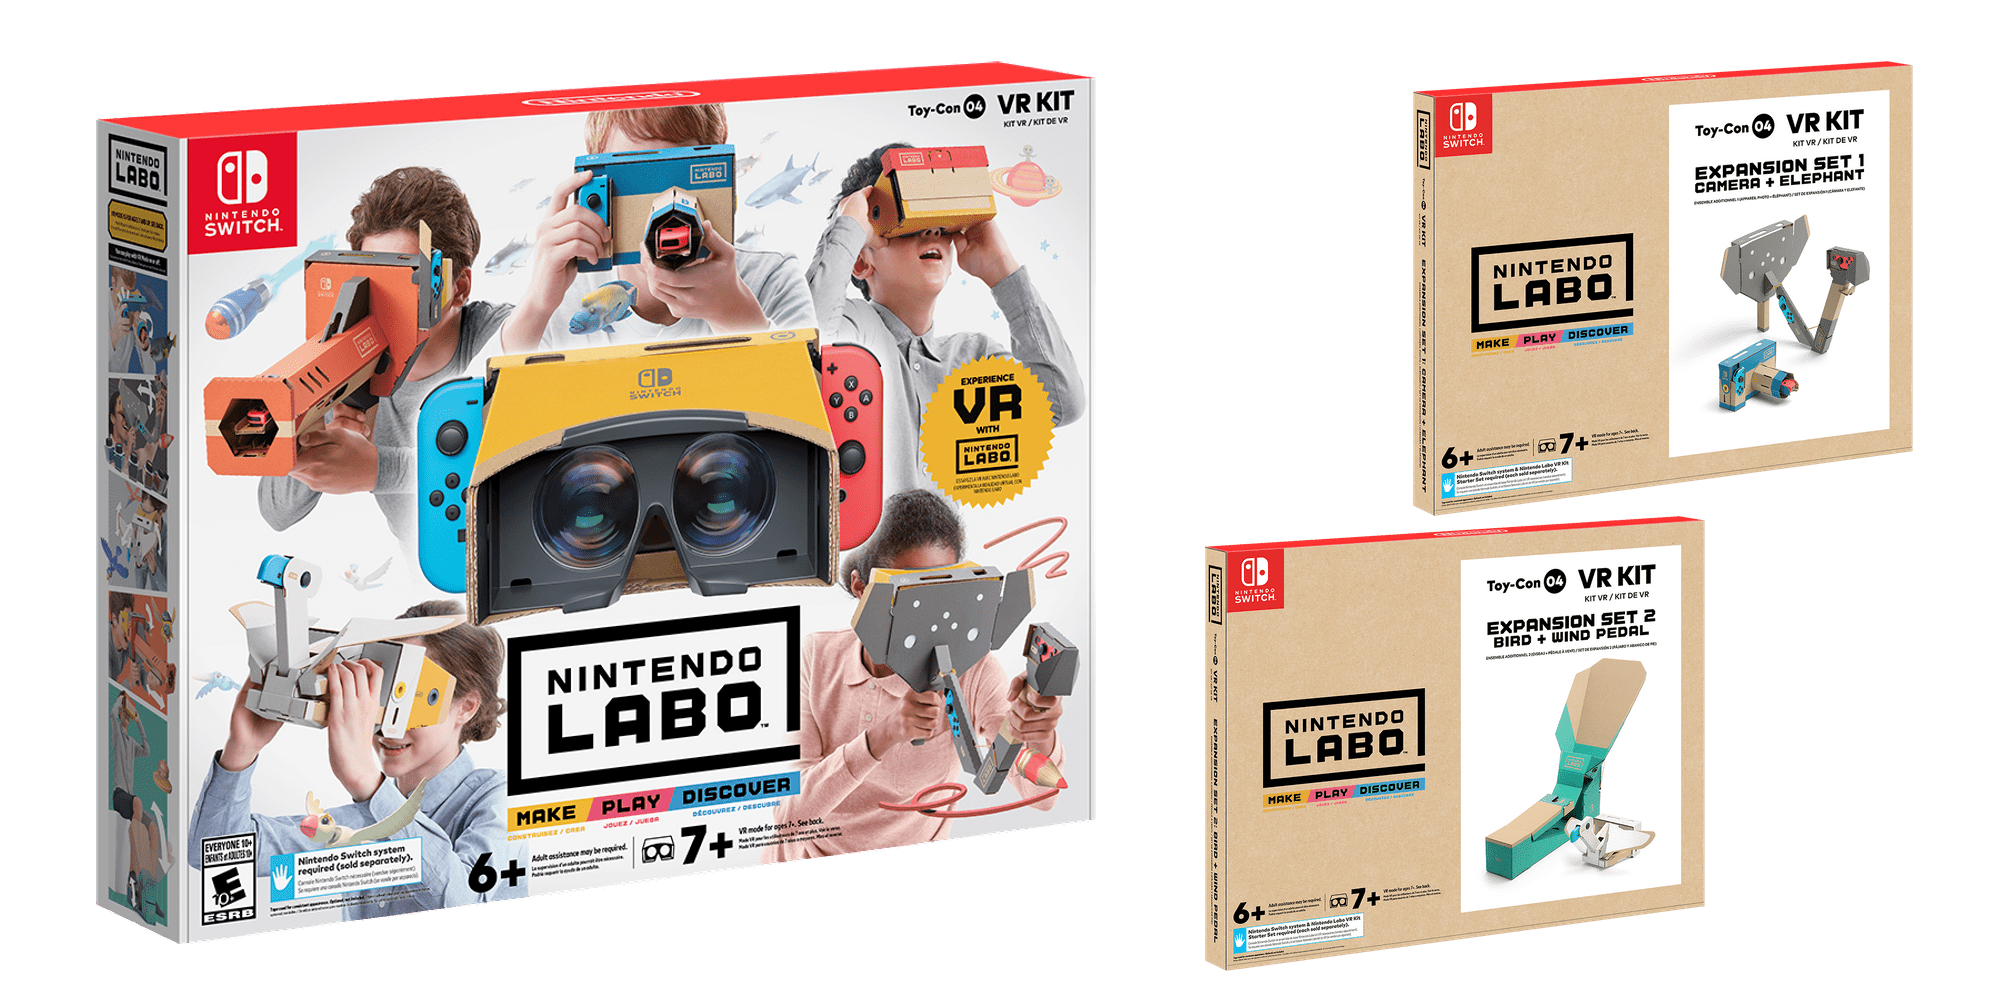 Nintendo Labo VR Kit box art